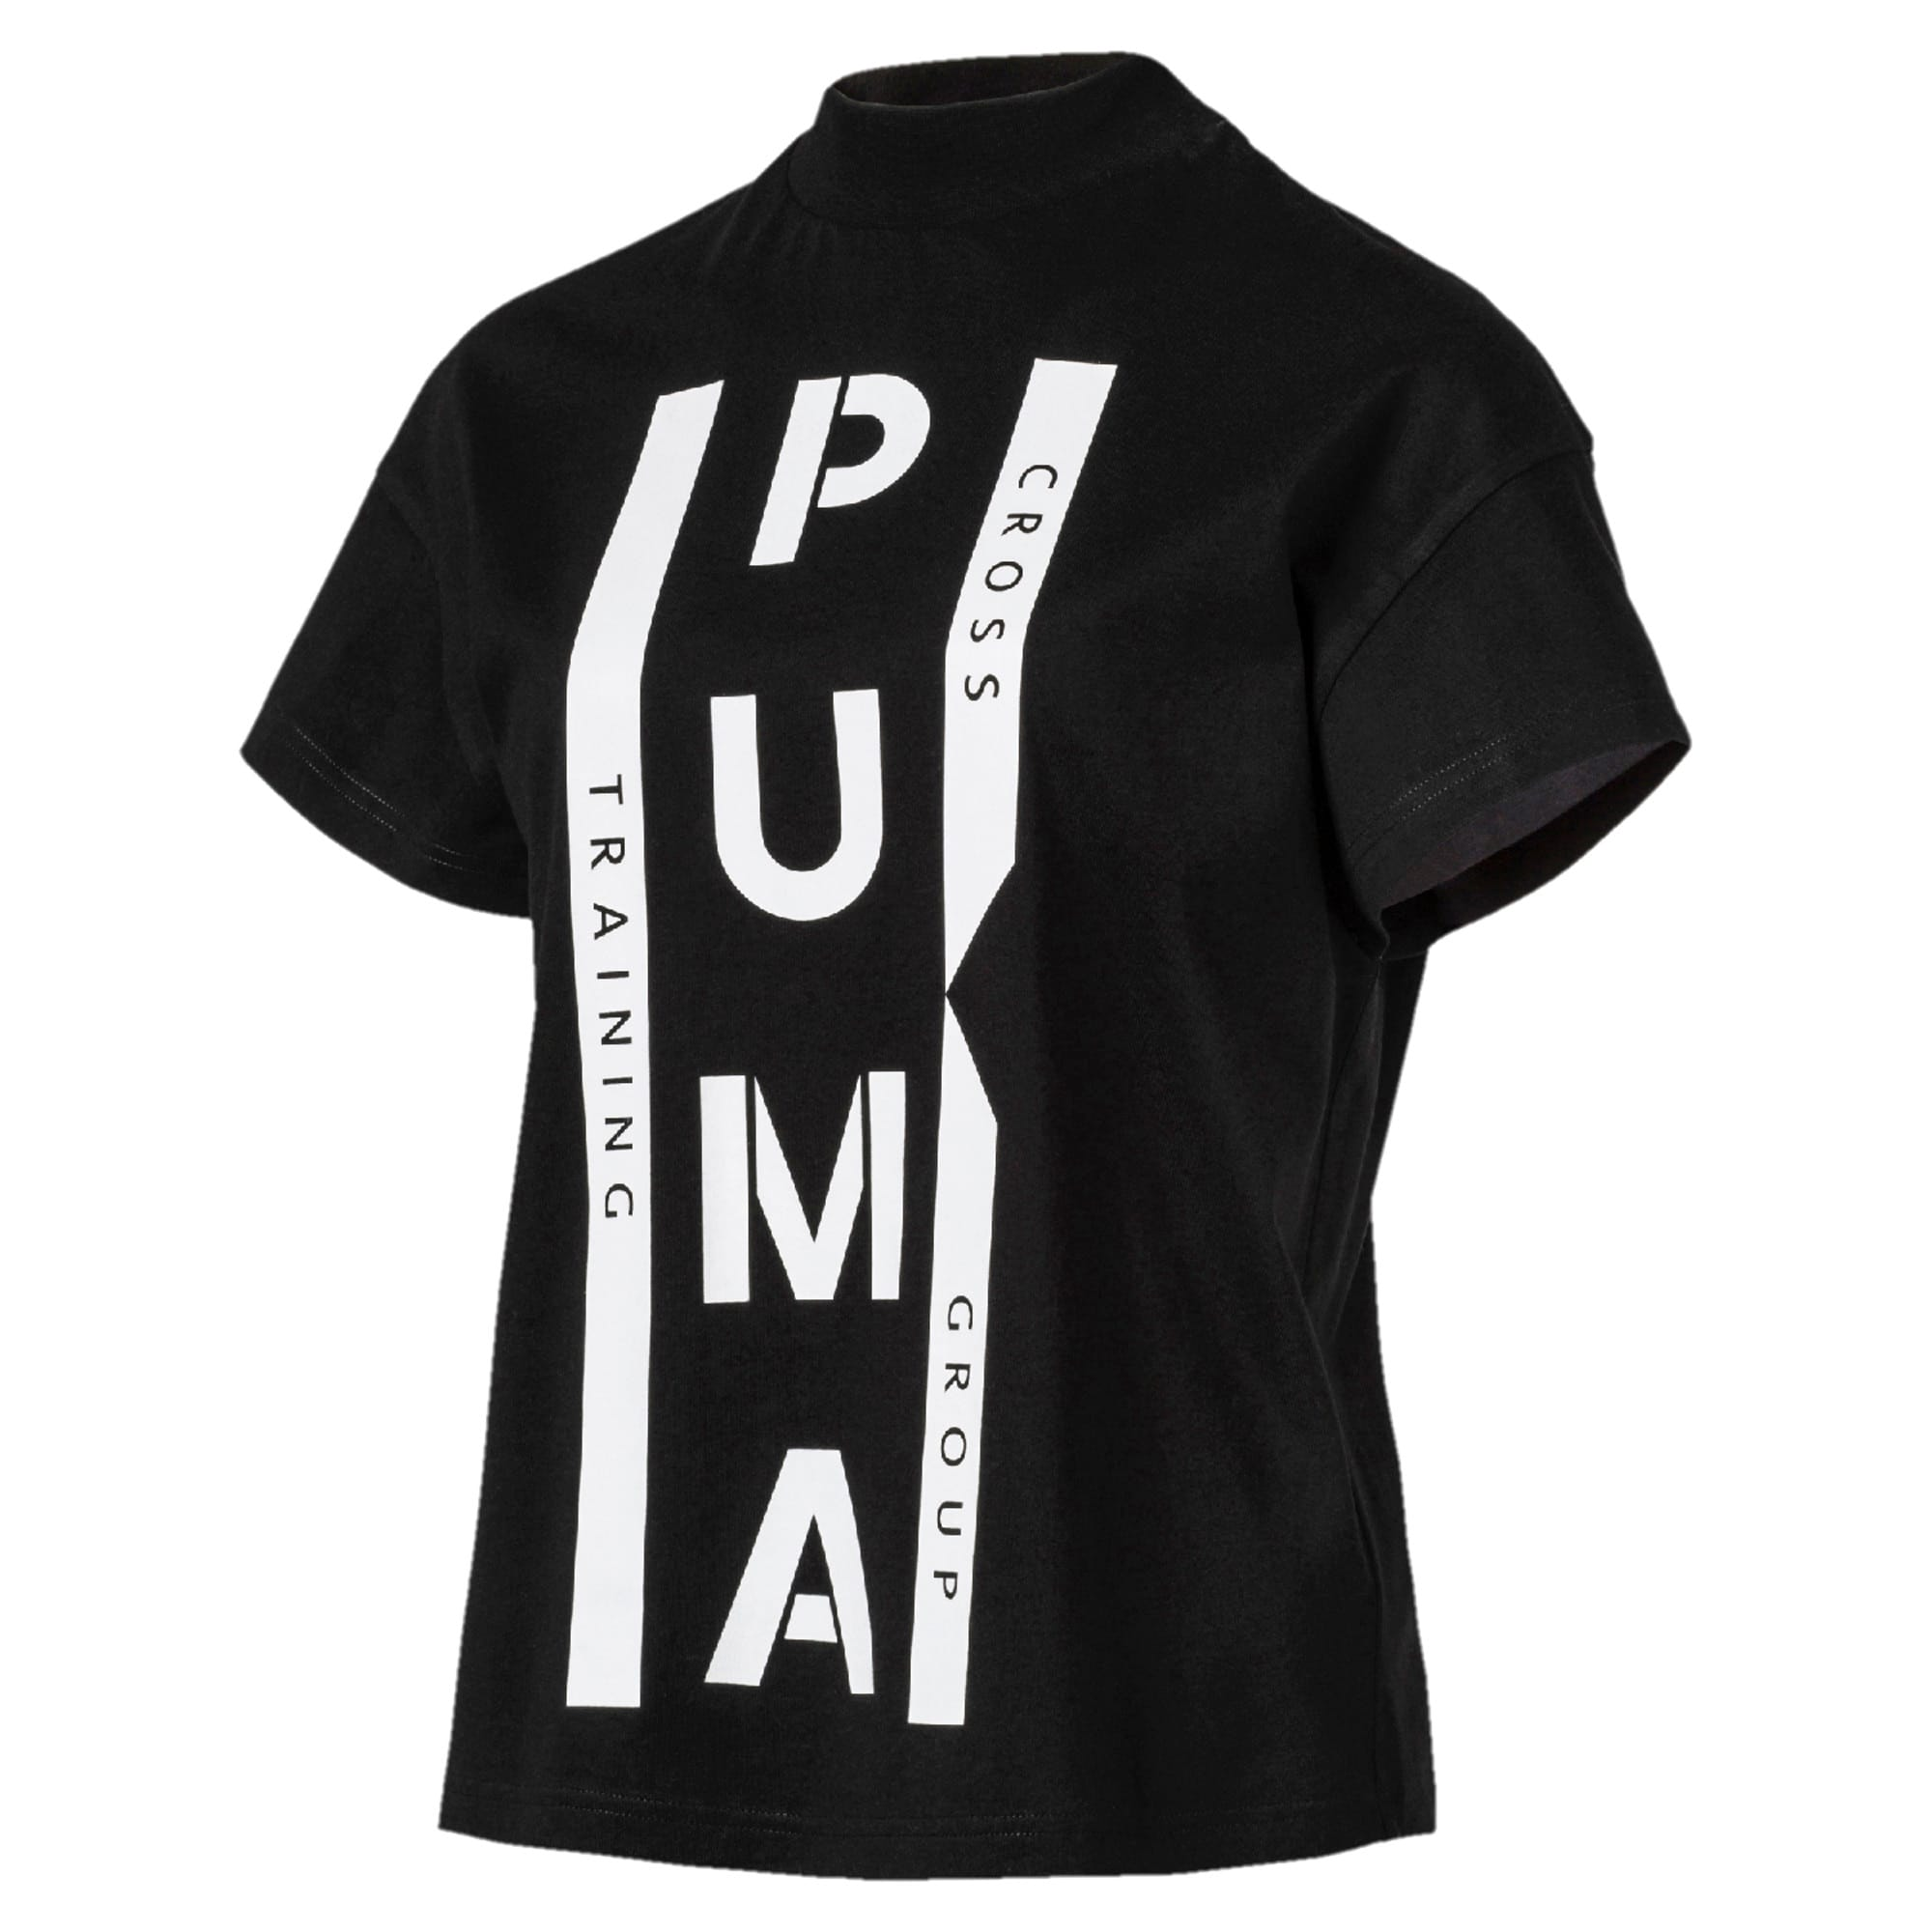 Thumbnail 1 of PUMA XTG グラフィック ウィメンズ SS Tシャツ 半袖, Cotton Black, medium-JPN